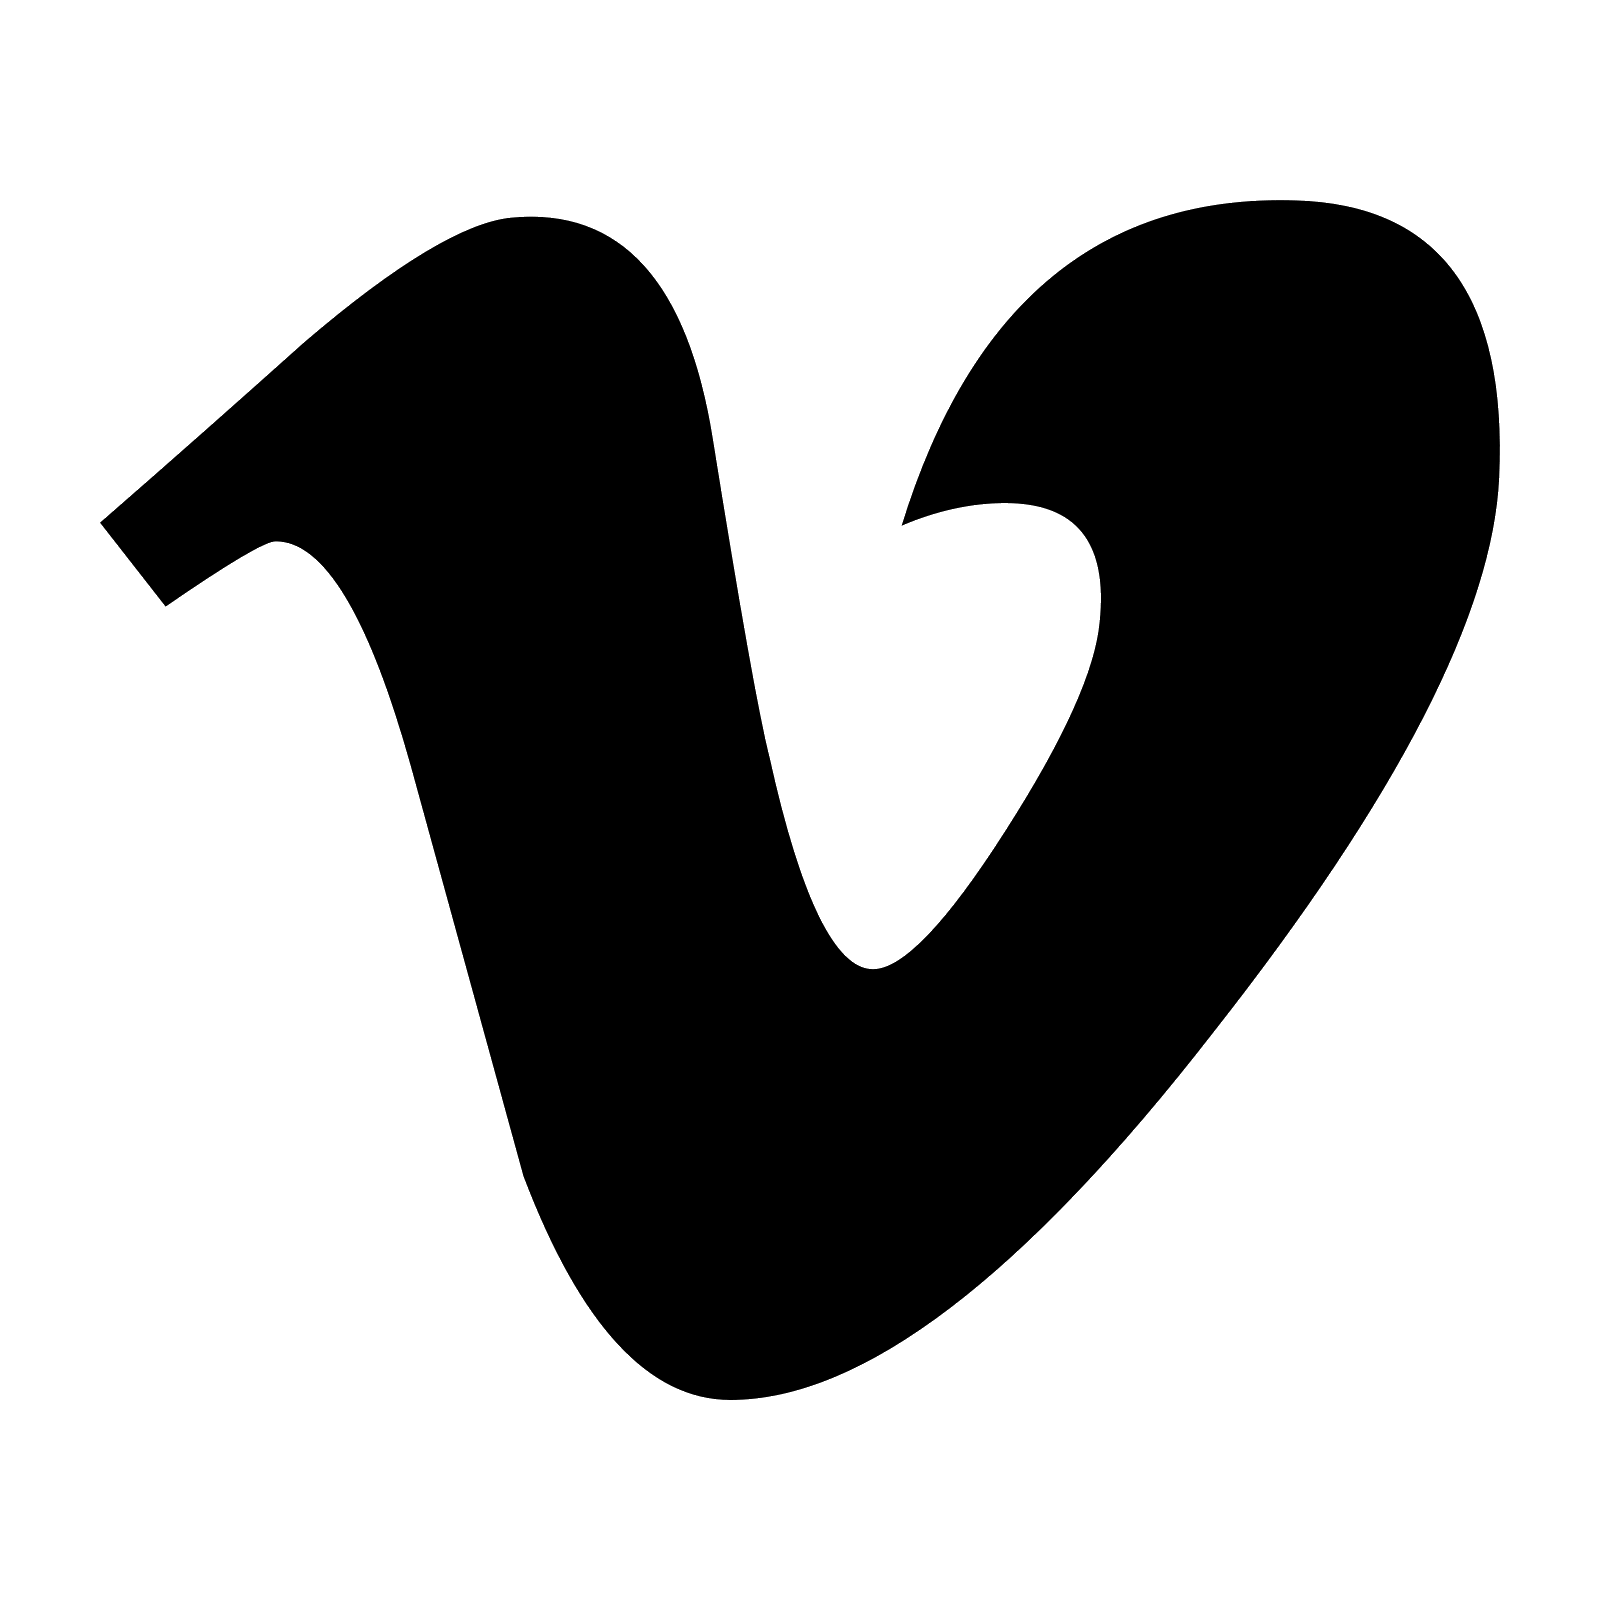 kisspng-vimeo-logo-download-5b3e0da032ae39.5710784215307933762076